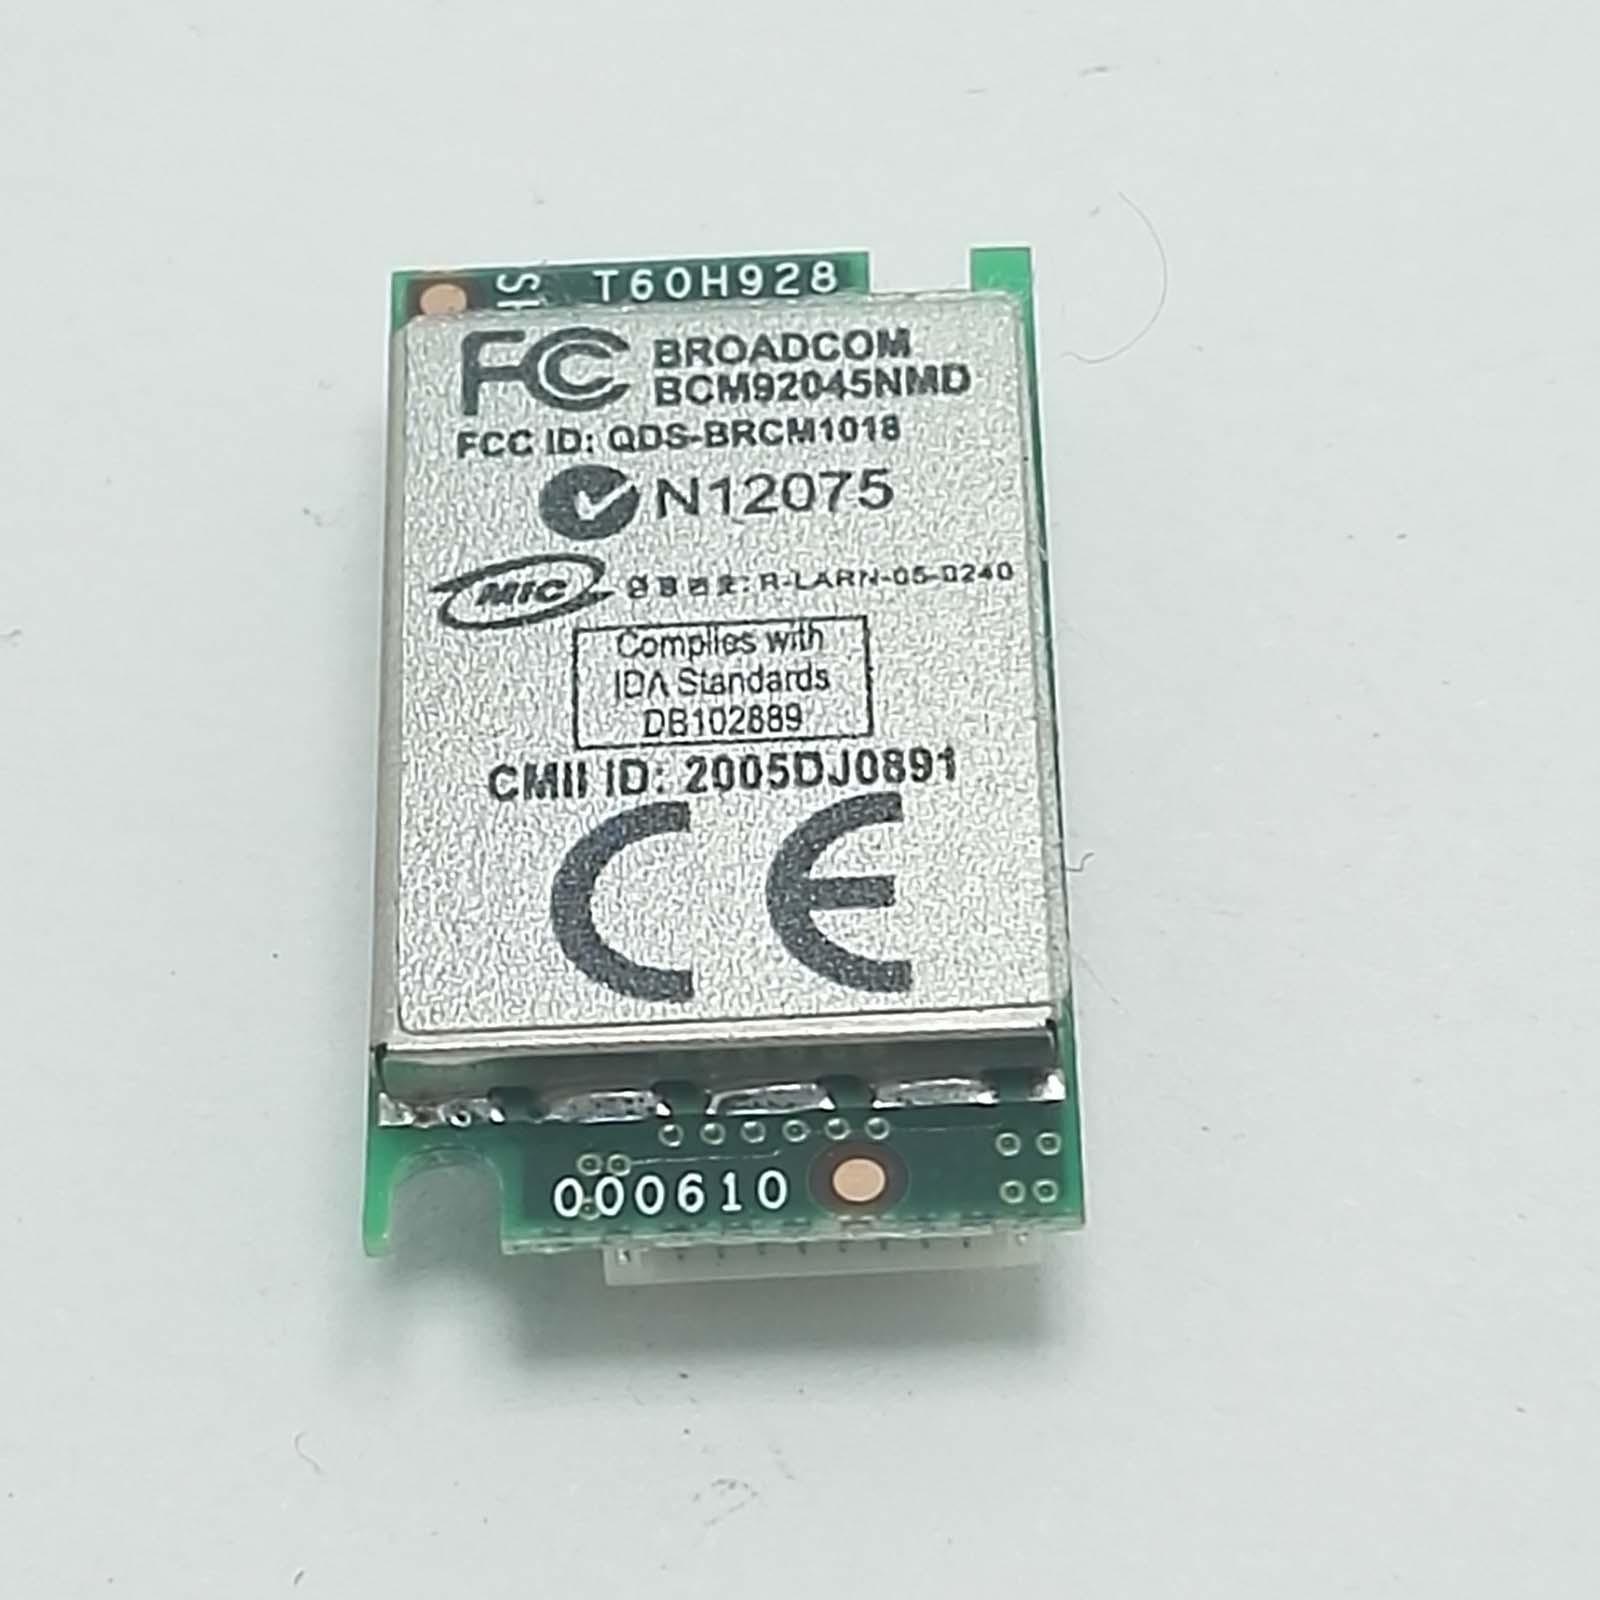 Bluetooth Samsung R60 Plus NP-R60S Broadcom BCM92045NMD Pavilion DV6000 HP 550